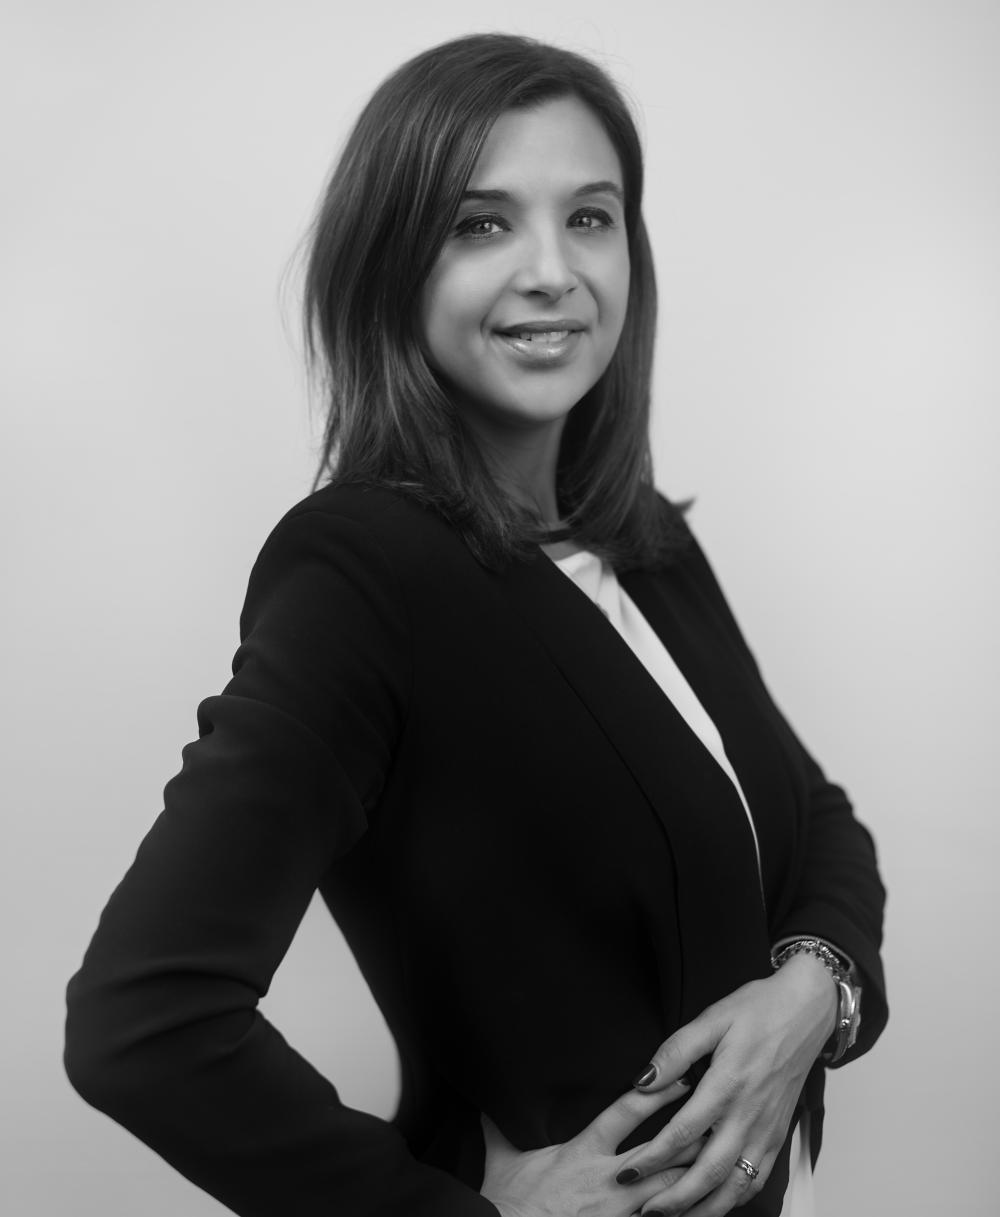 Gaia Bardazzi